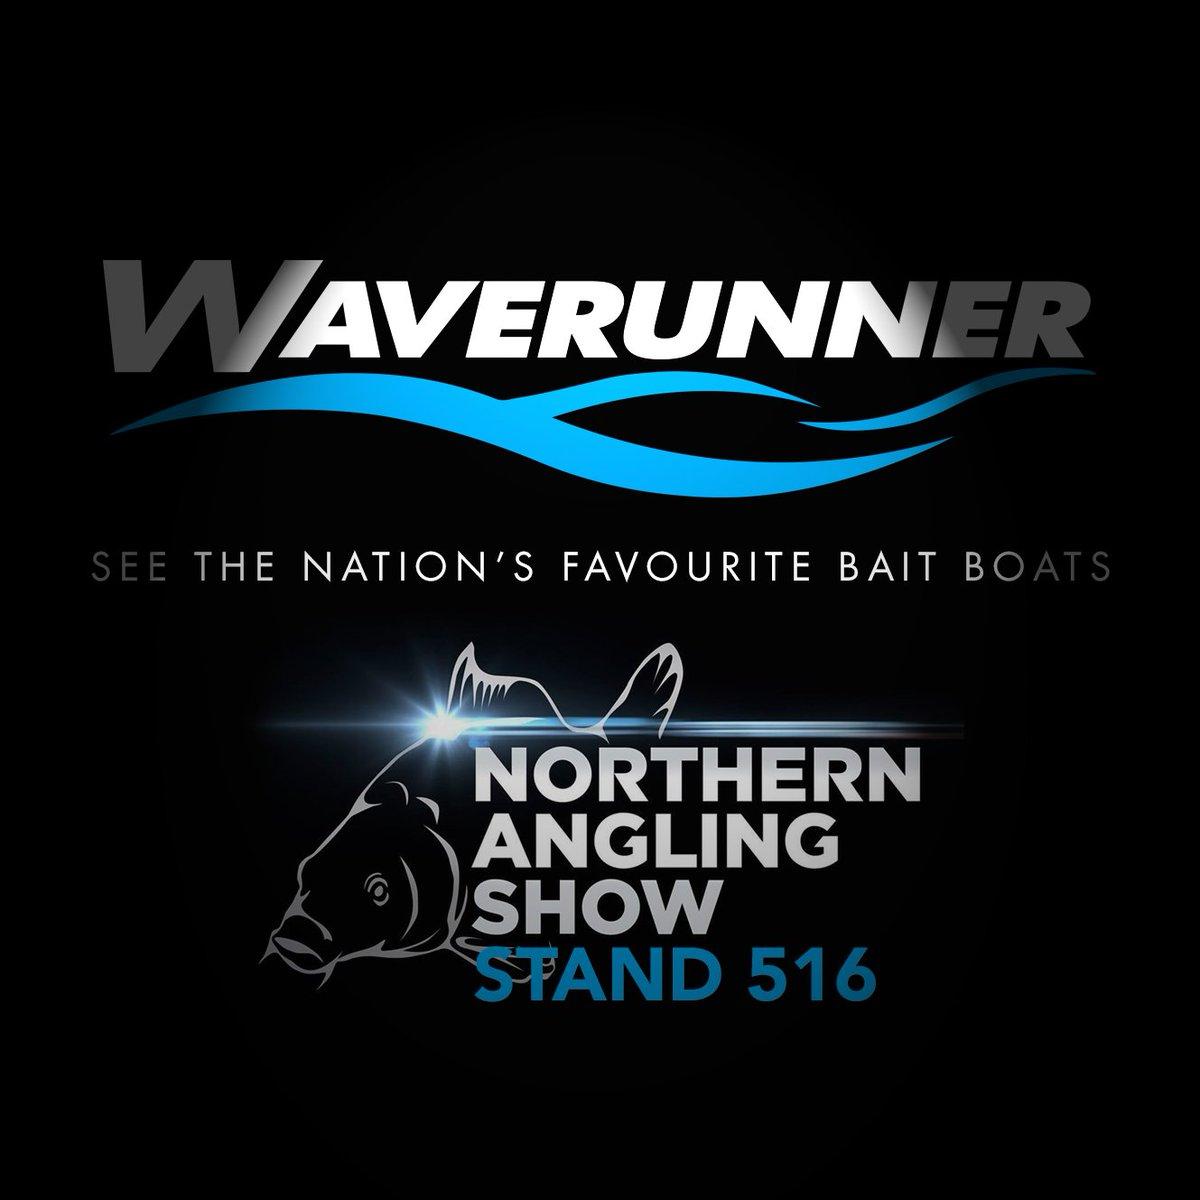 Have you seen the Fish Finders? #NAS #Northern #<b>Baitboat</b> #carpfishing #waverunner https://t.c